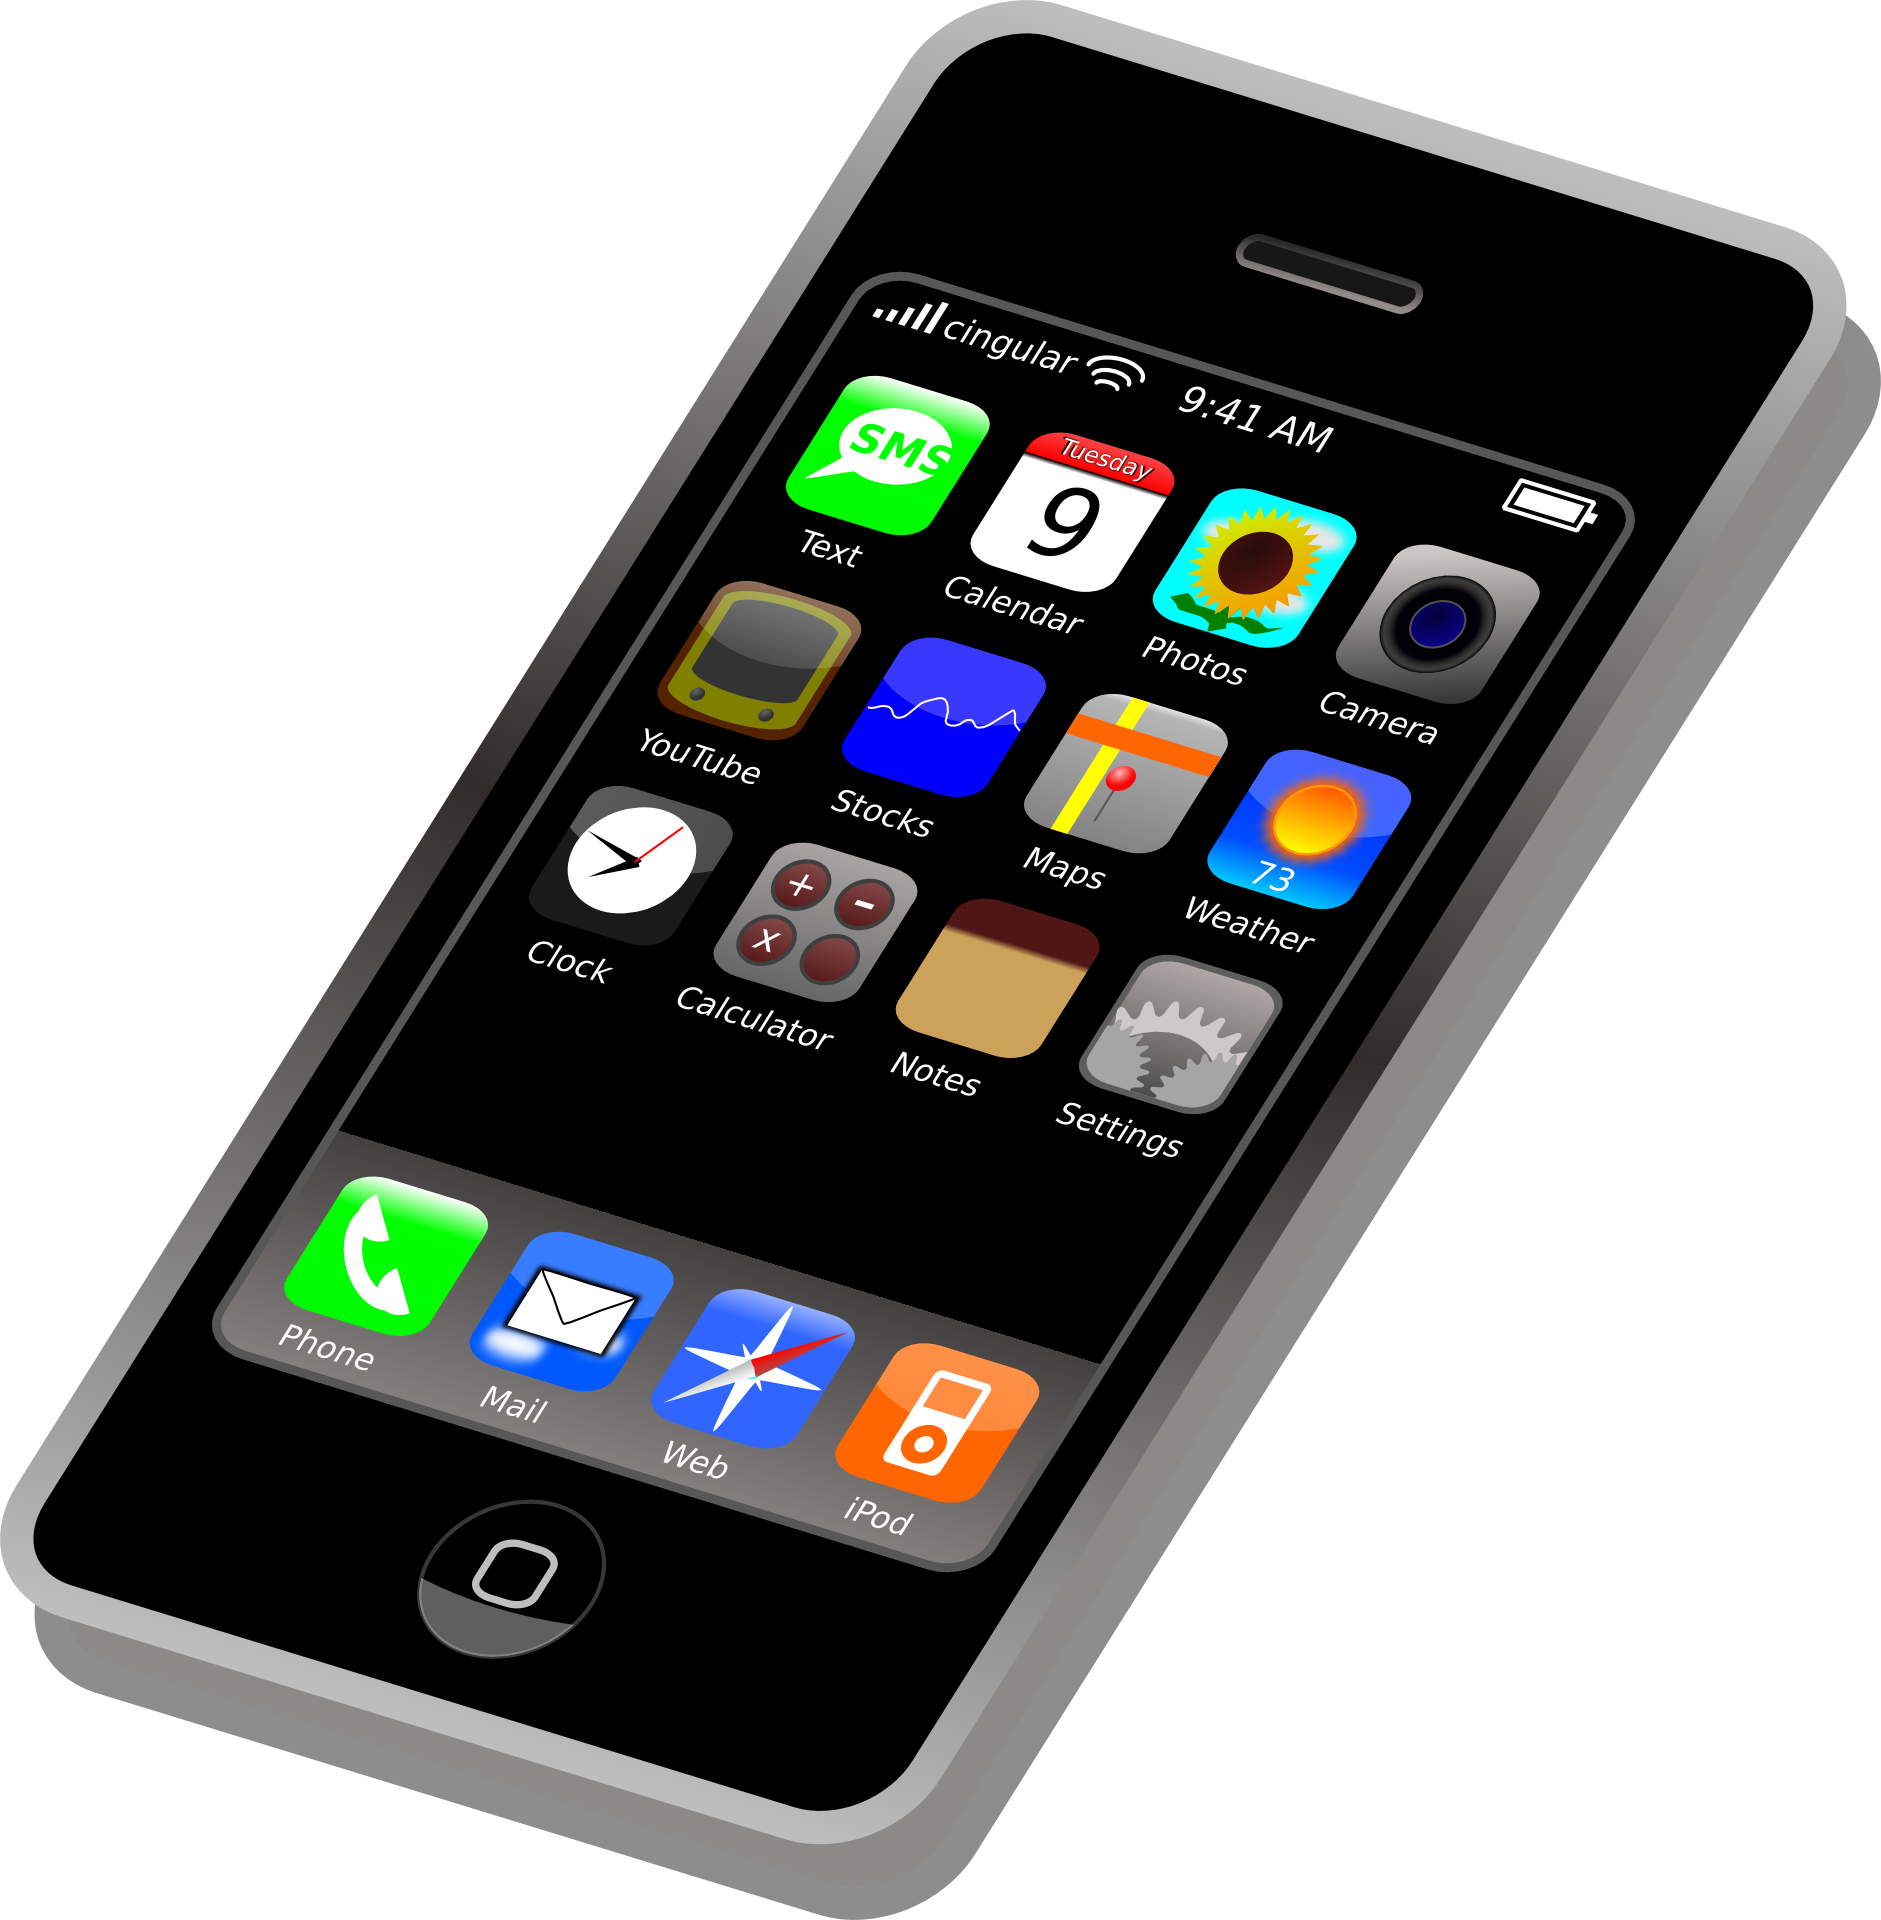 Mobilfunk Tarifvergleich